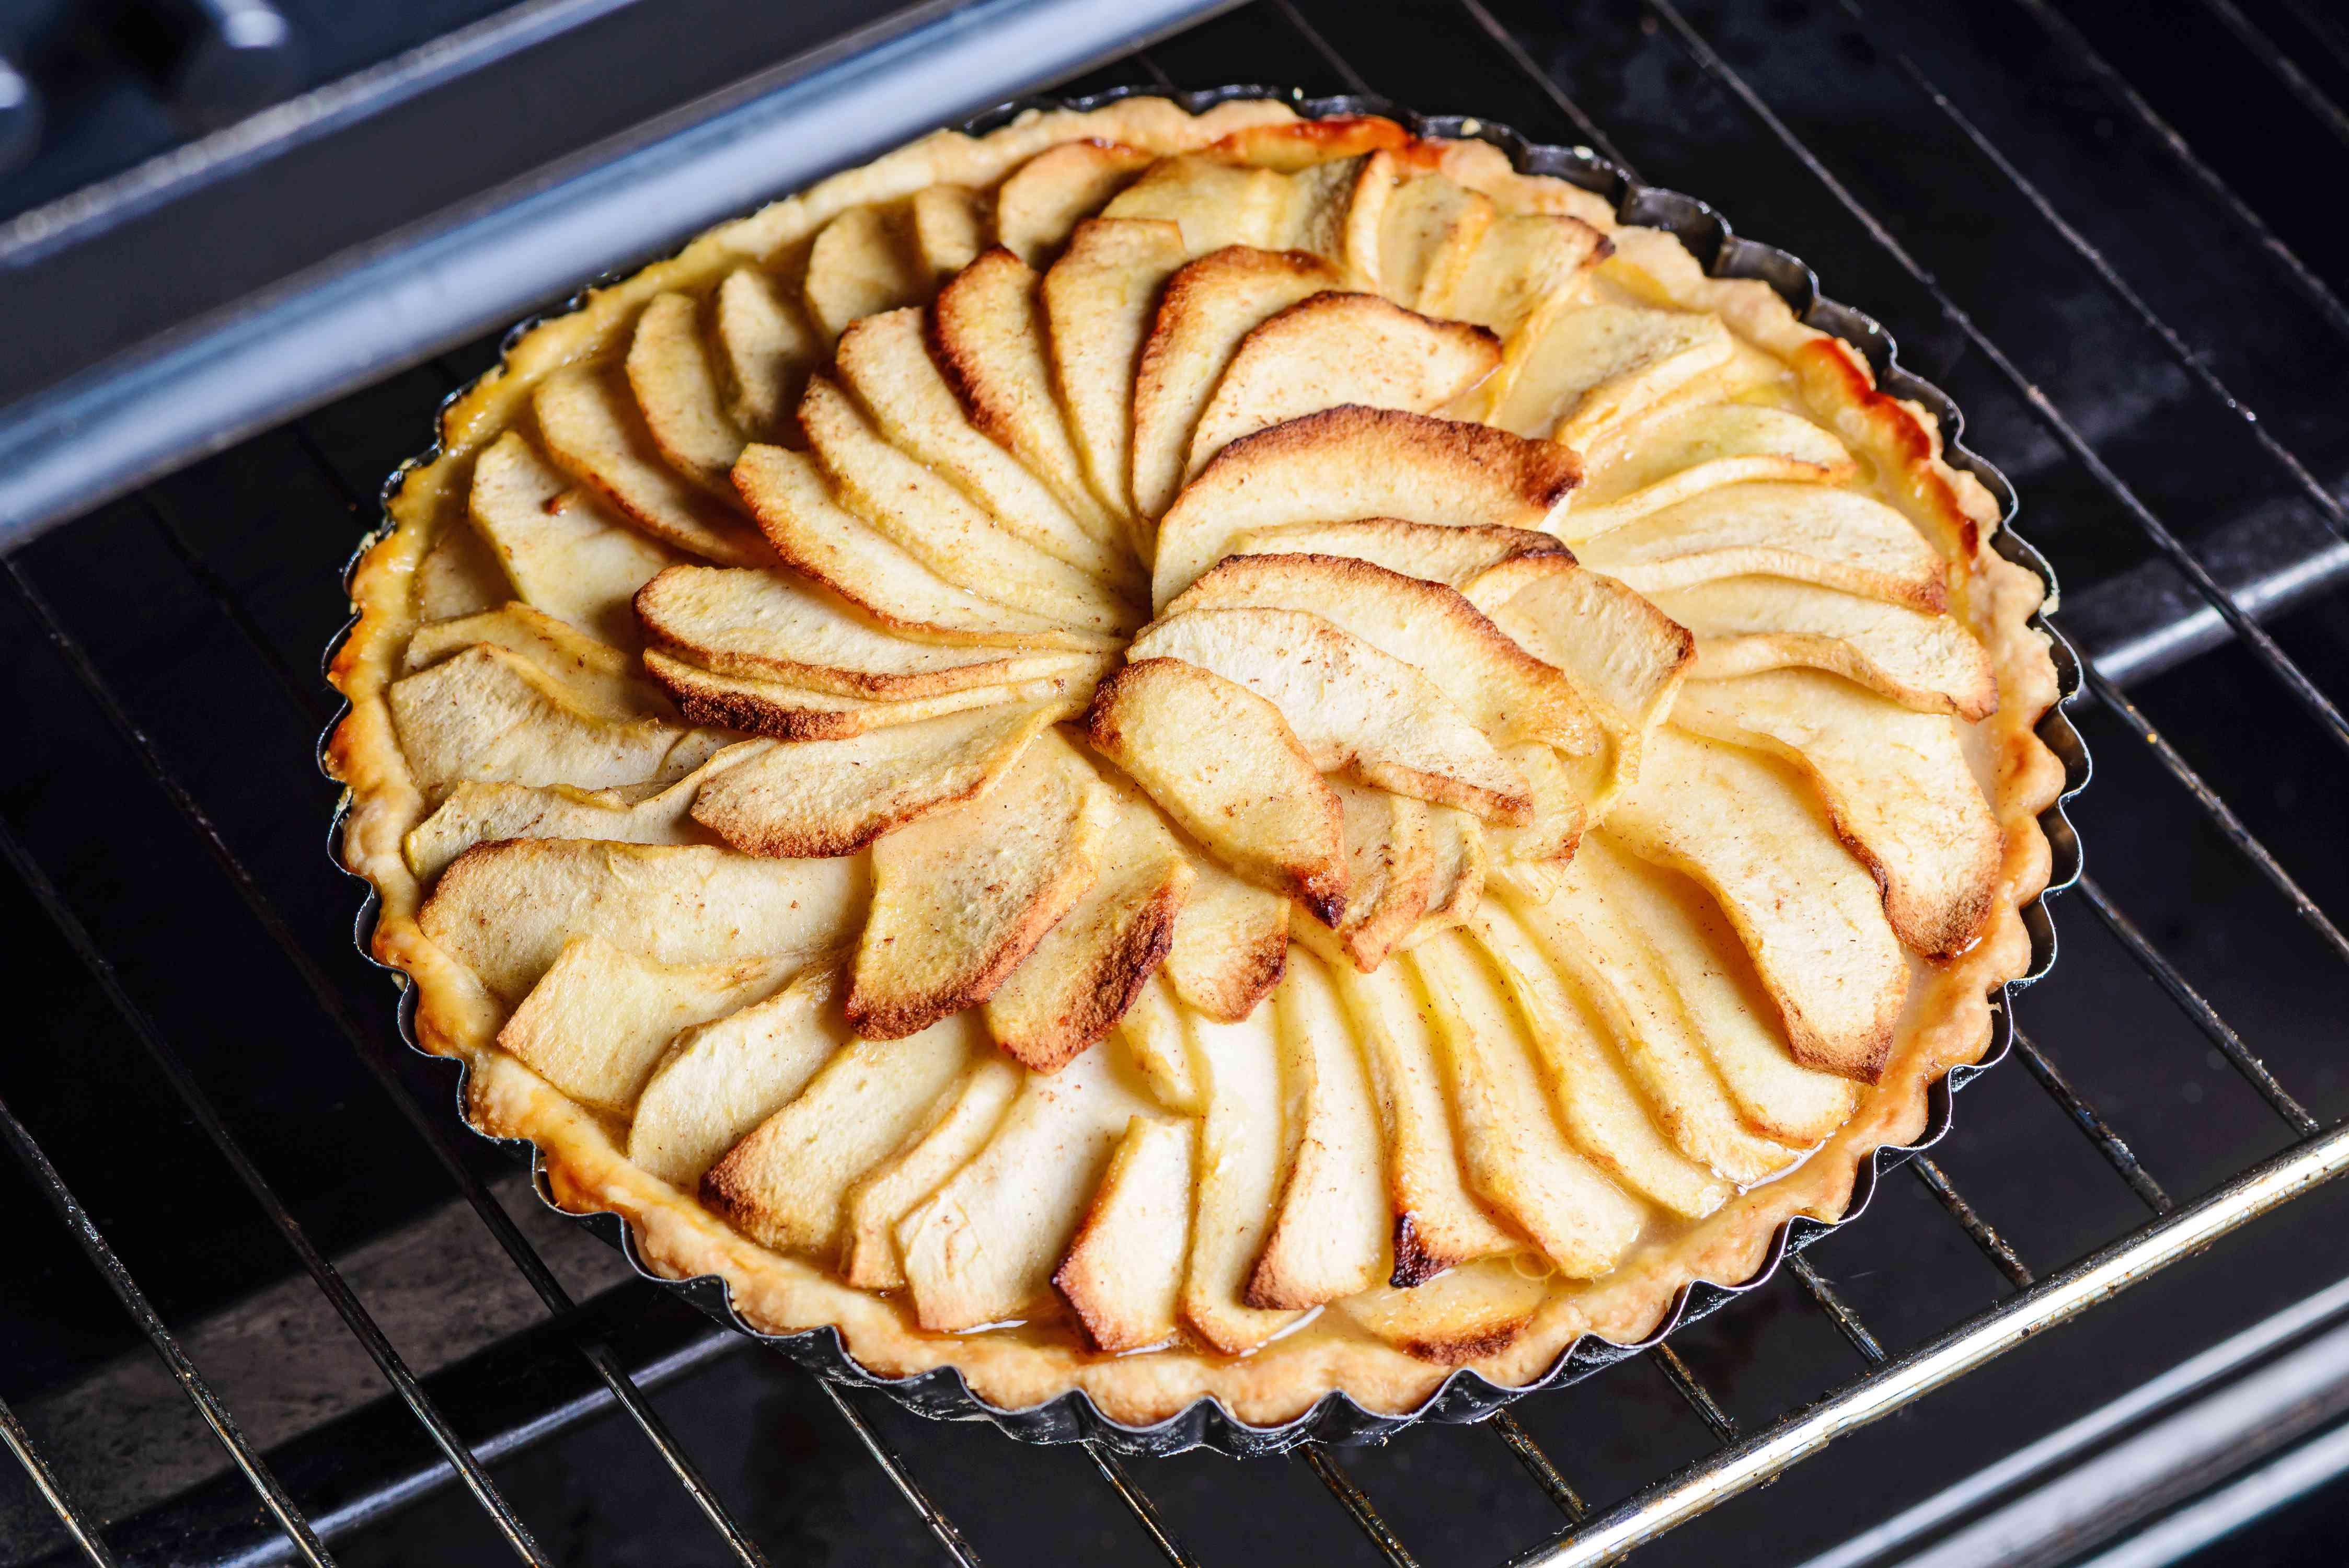 remove foil and bake apple tart more